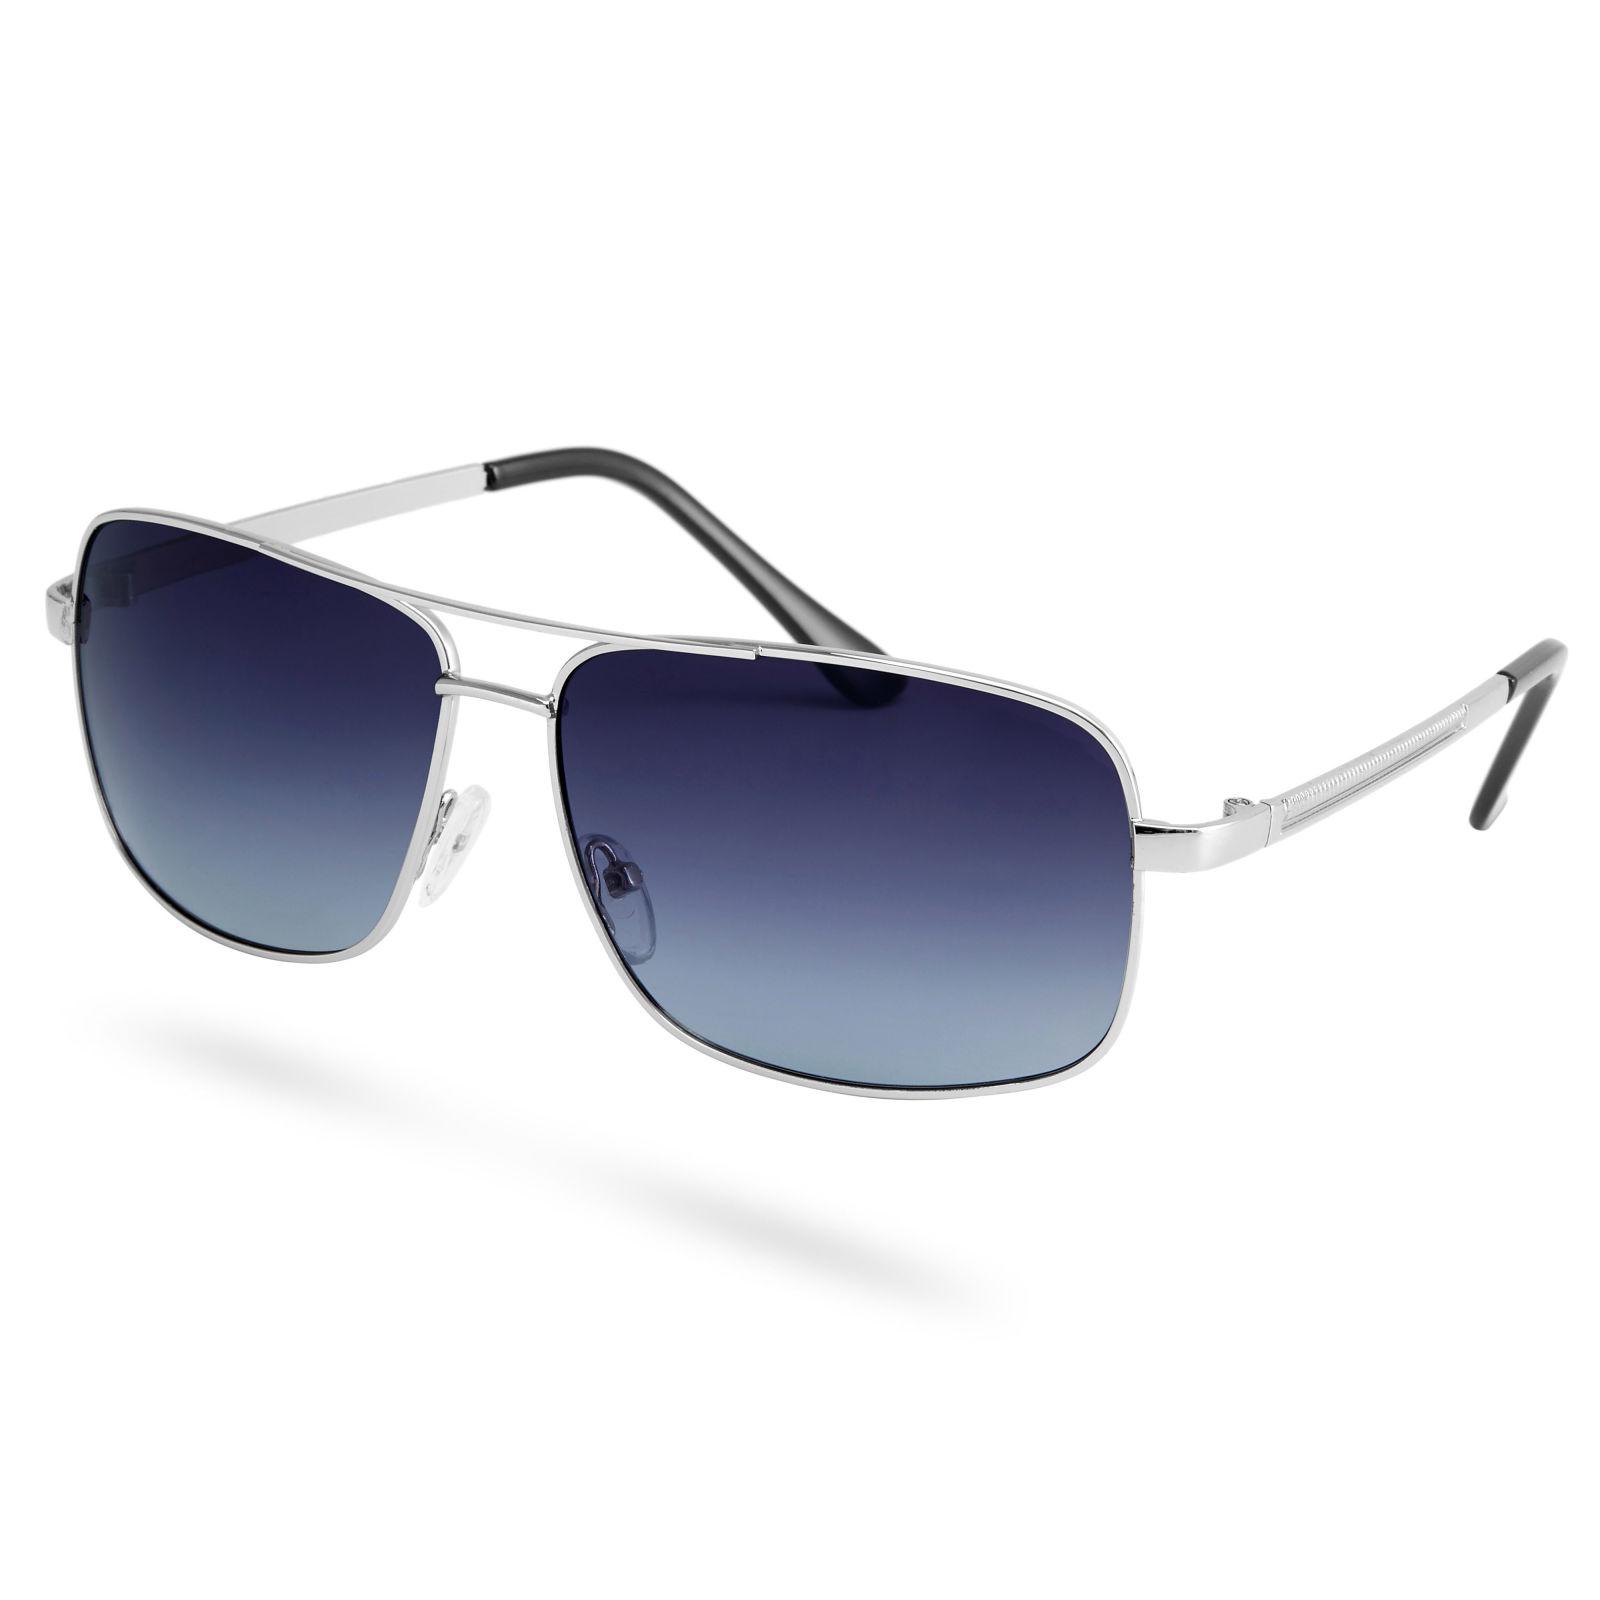 Silberne Getönte Polarisierte Sonnenbrille MOIGKiwX8